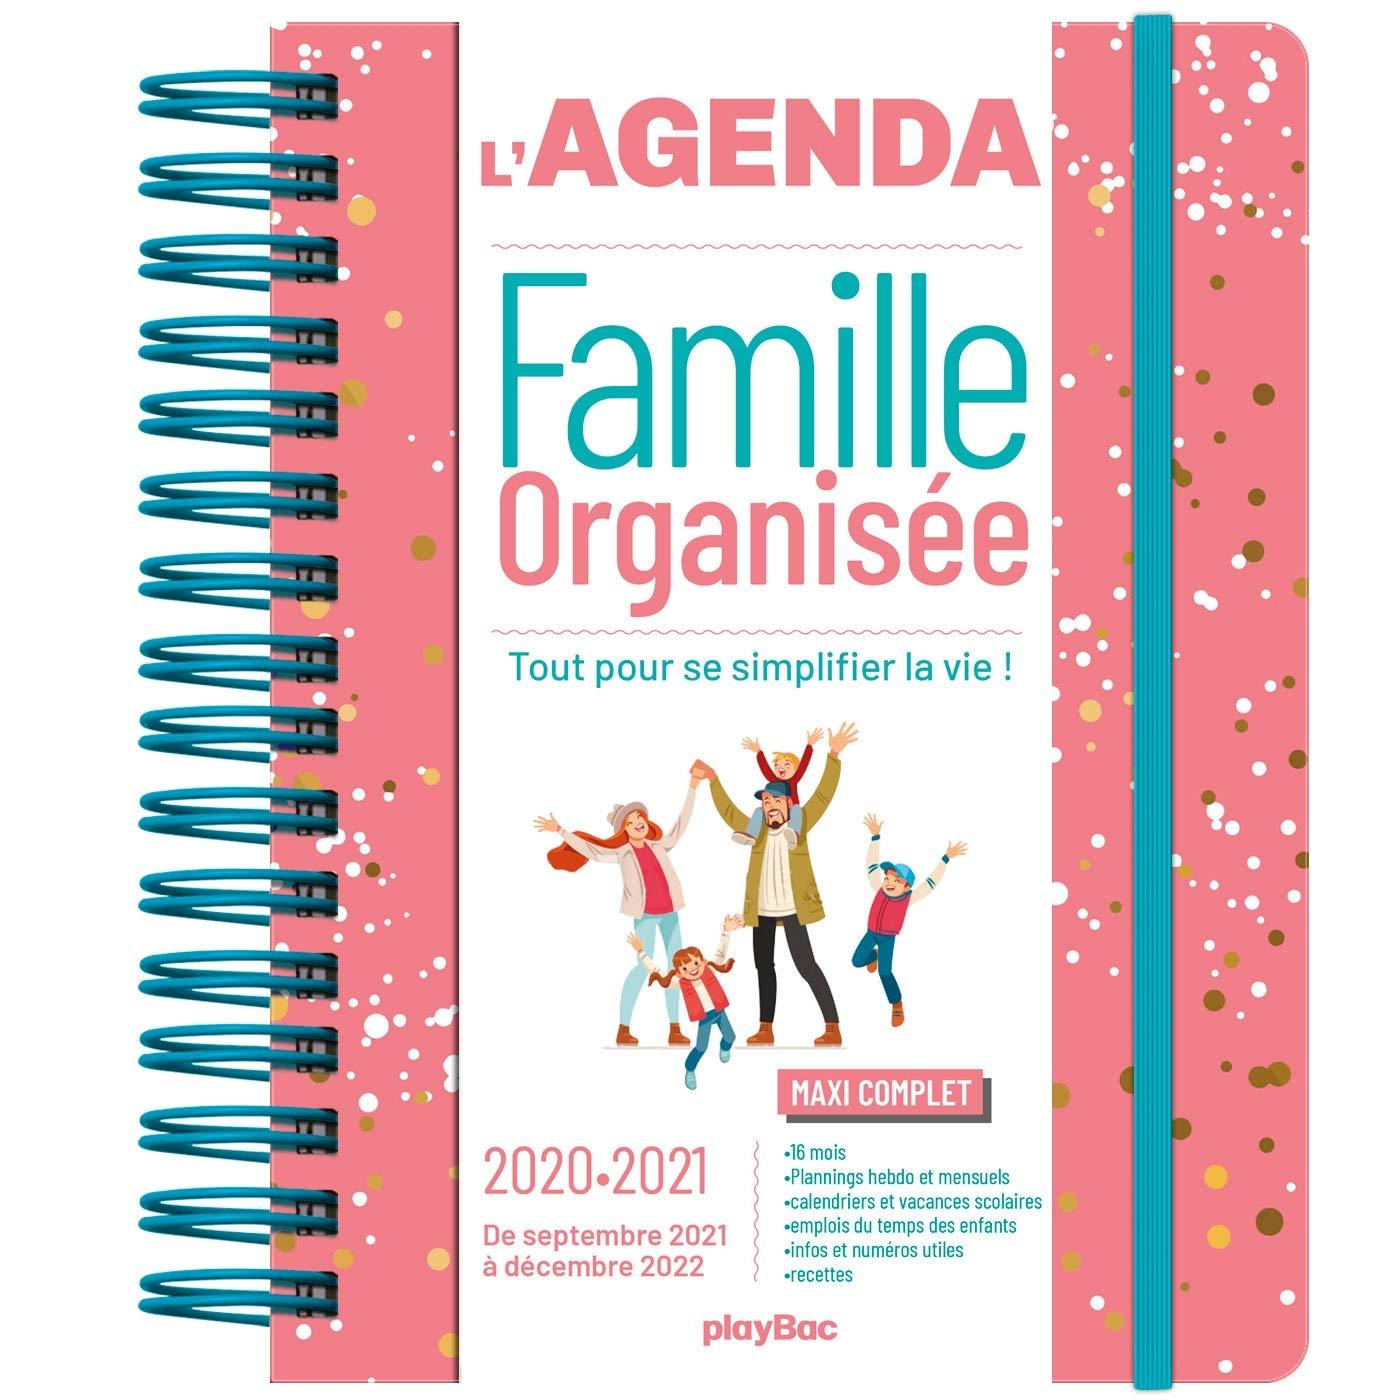 Agenda de la Famille Organisee 2021 (De Sept. 2020 a Dec. 2021) S